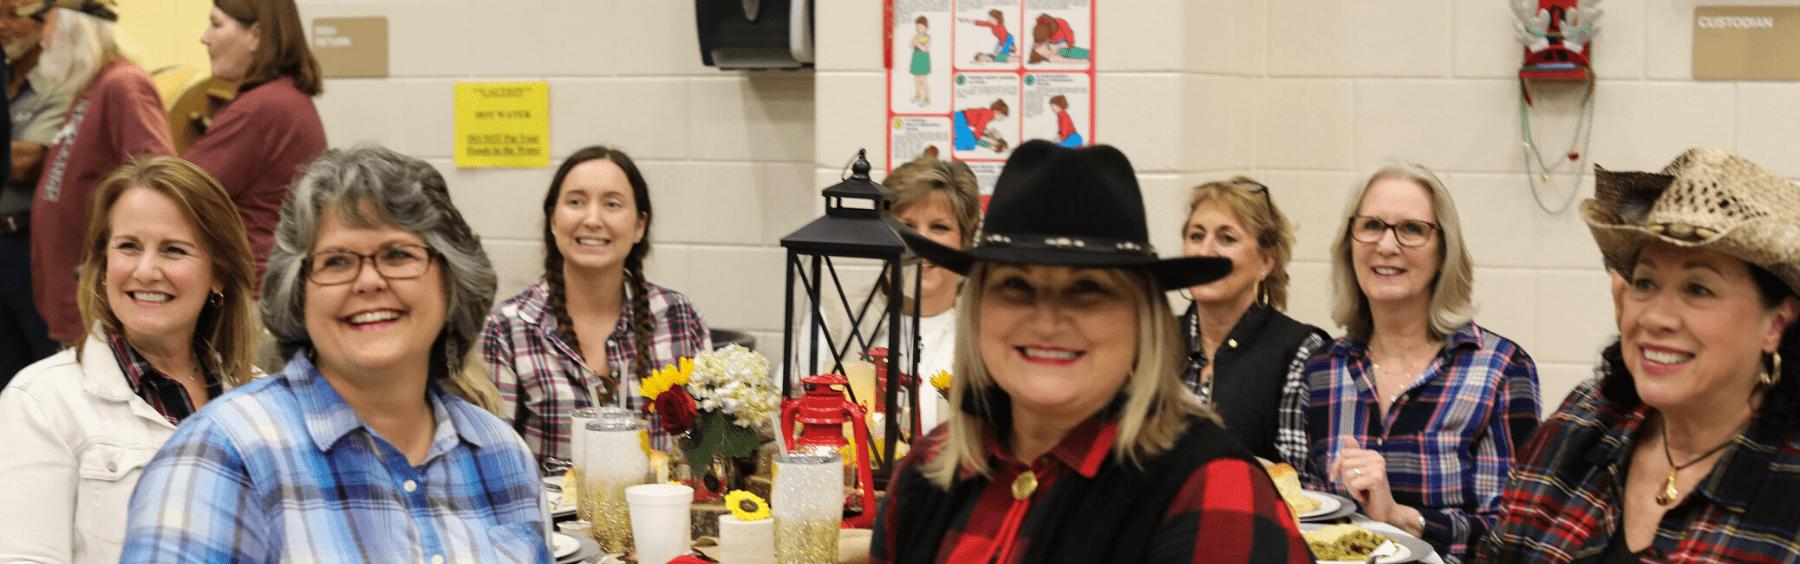 Effingham County's Catie's Gathering 2020